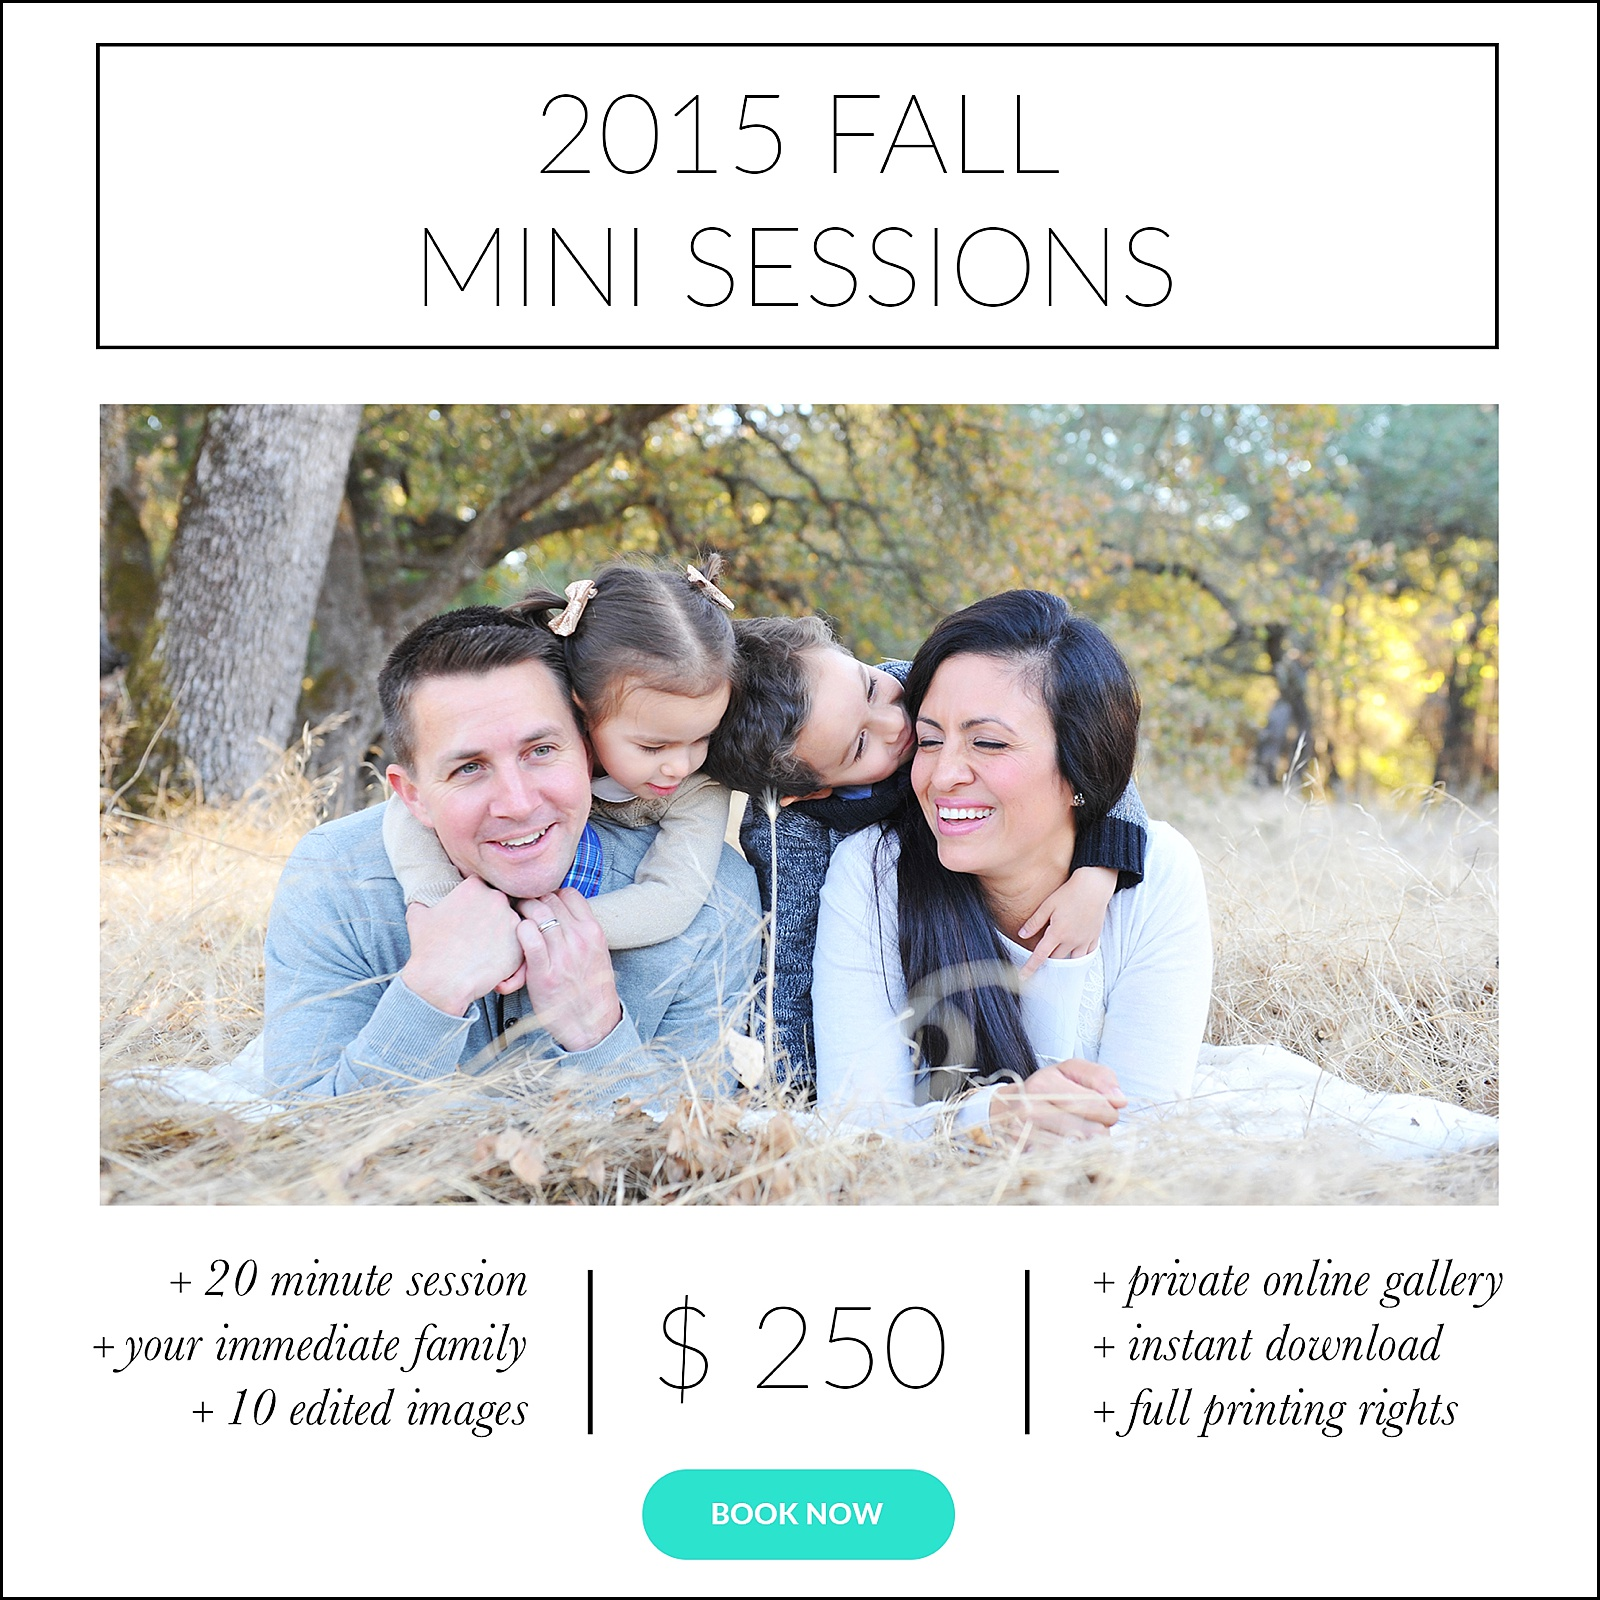 fall minis2_blog.jpg